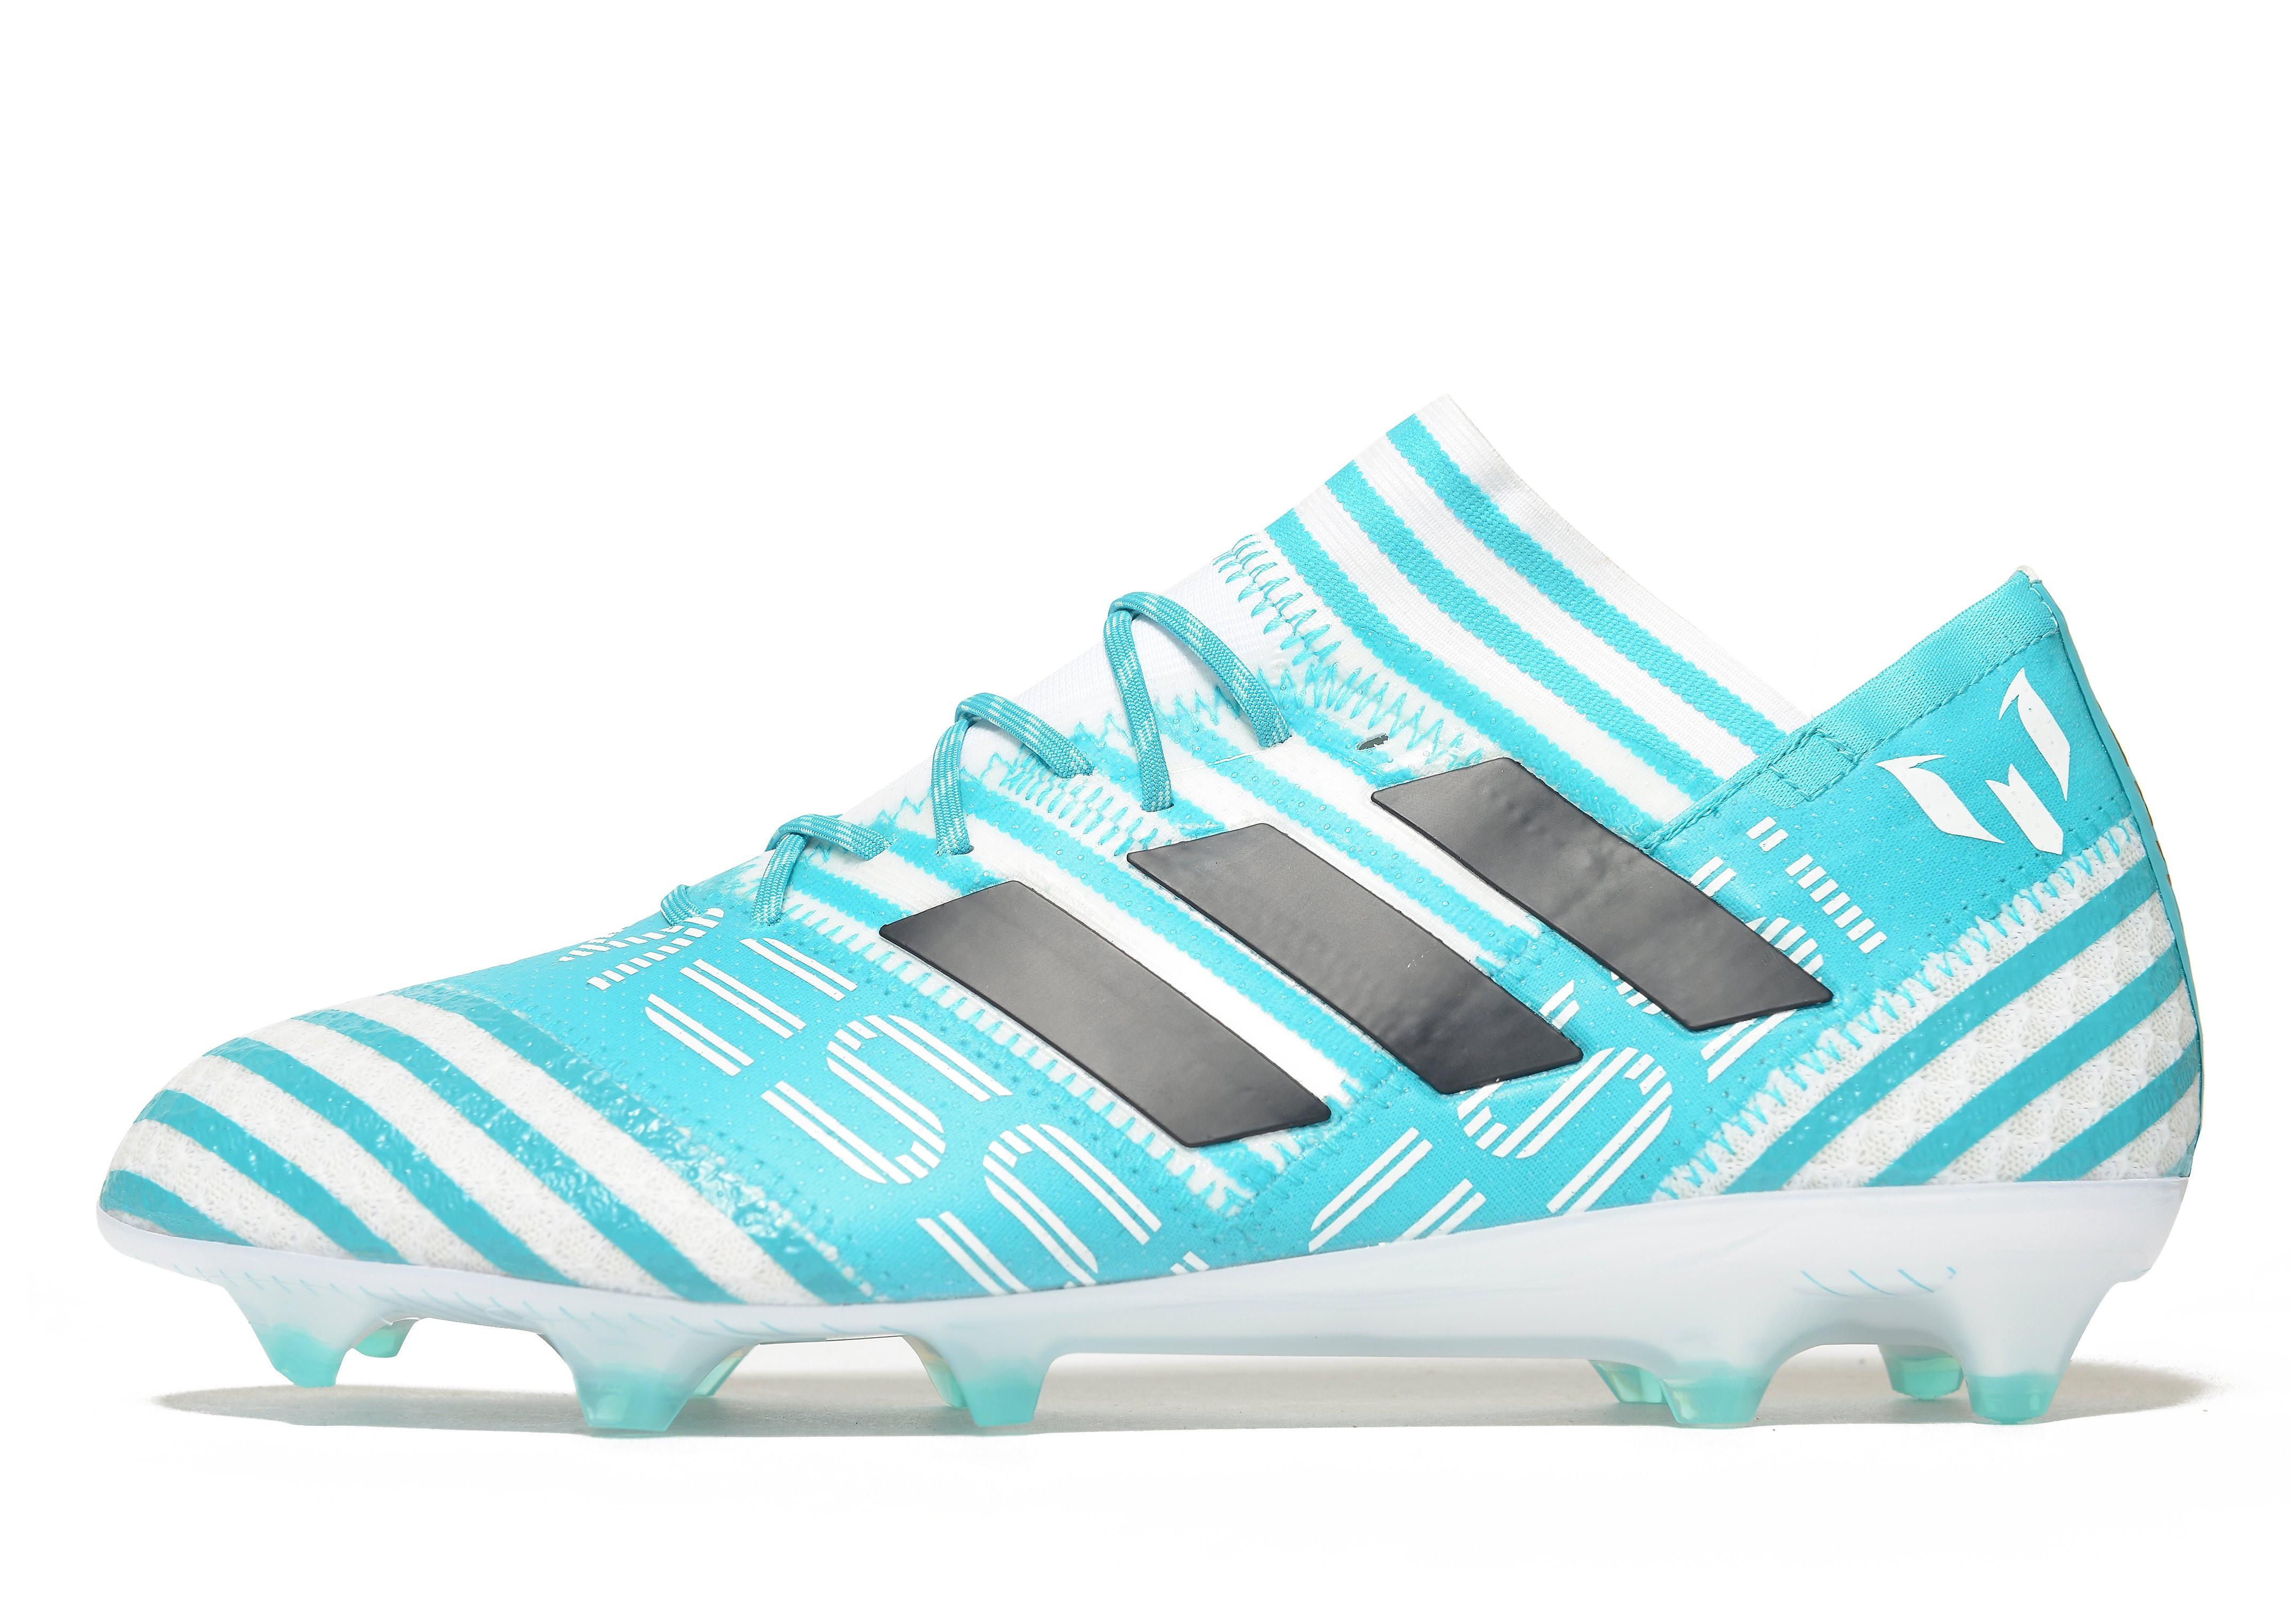 adidas Ocean Storm Nemeziz 17.1 FG Messi